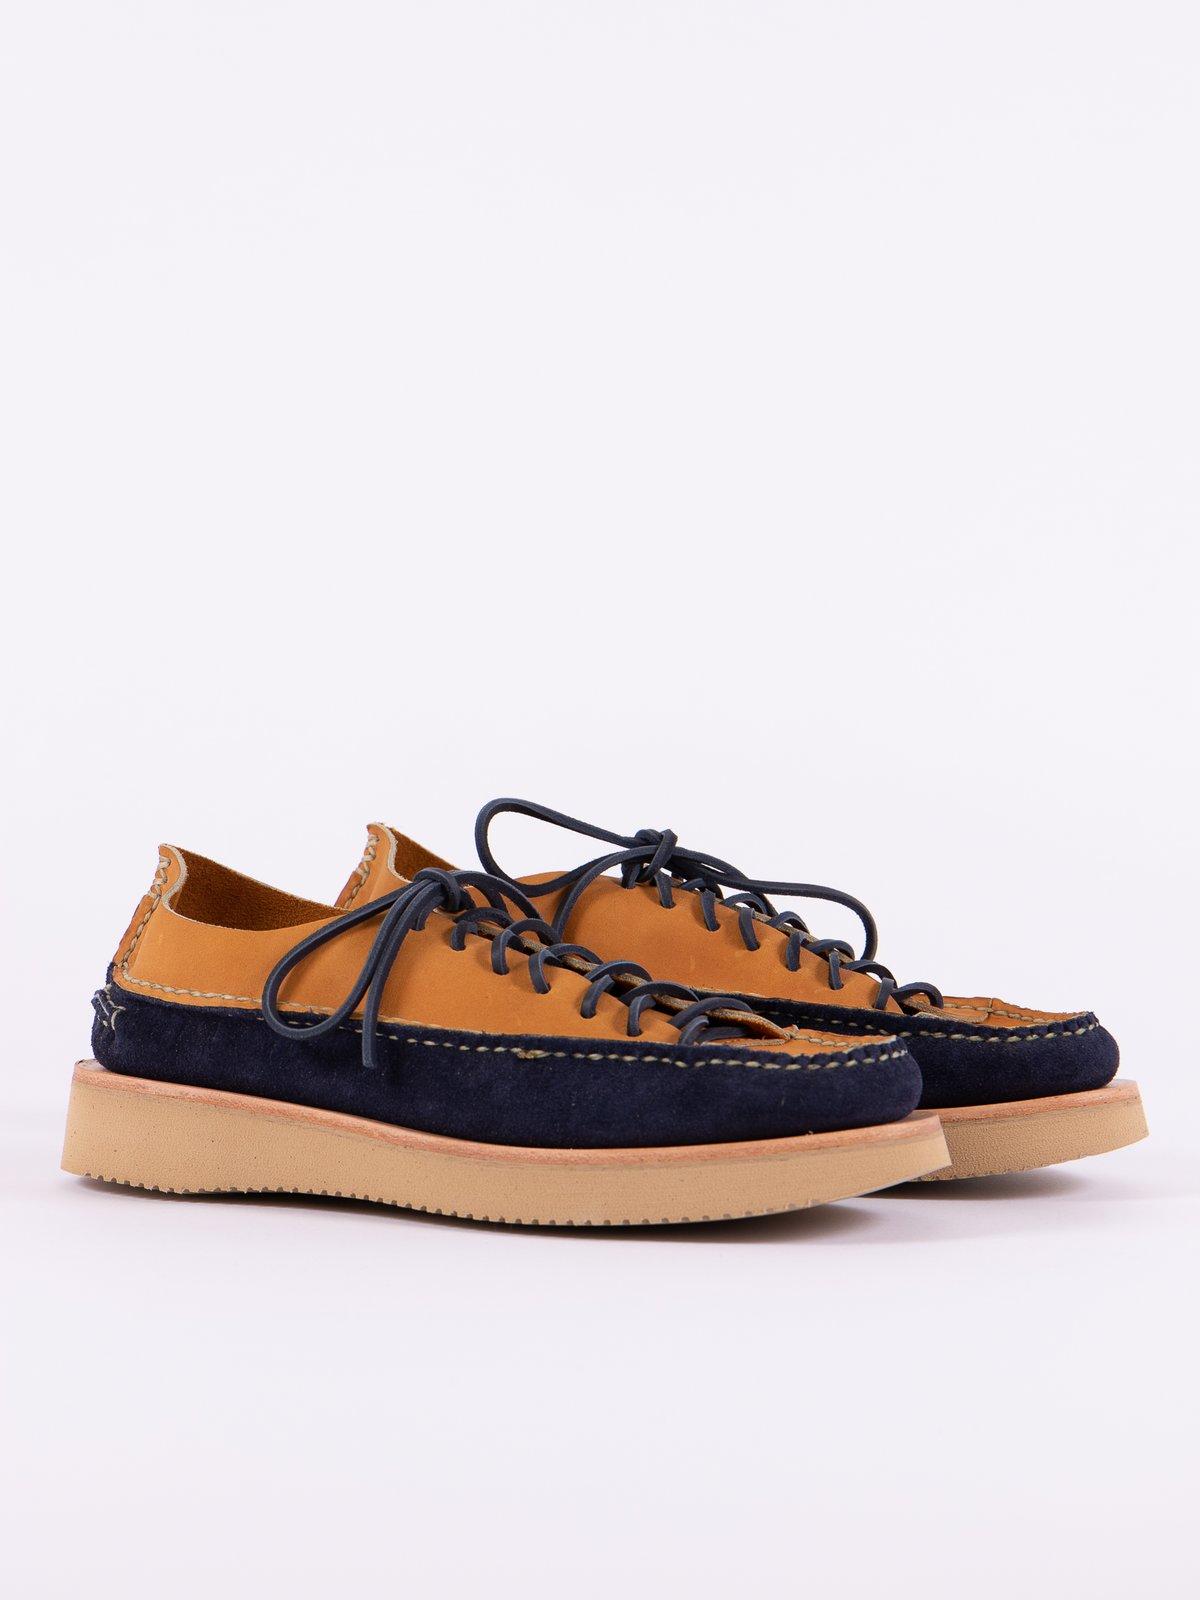 Indigo/Tan All Handsewn Sneaker Moc Ox Exclusive - Image 1